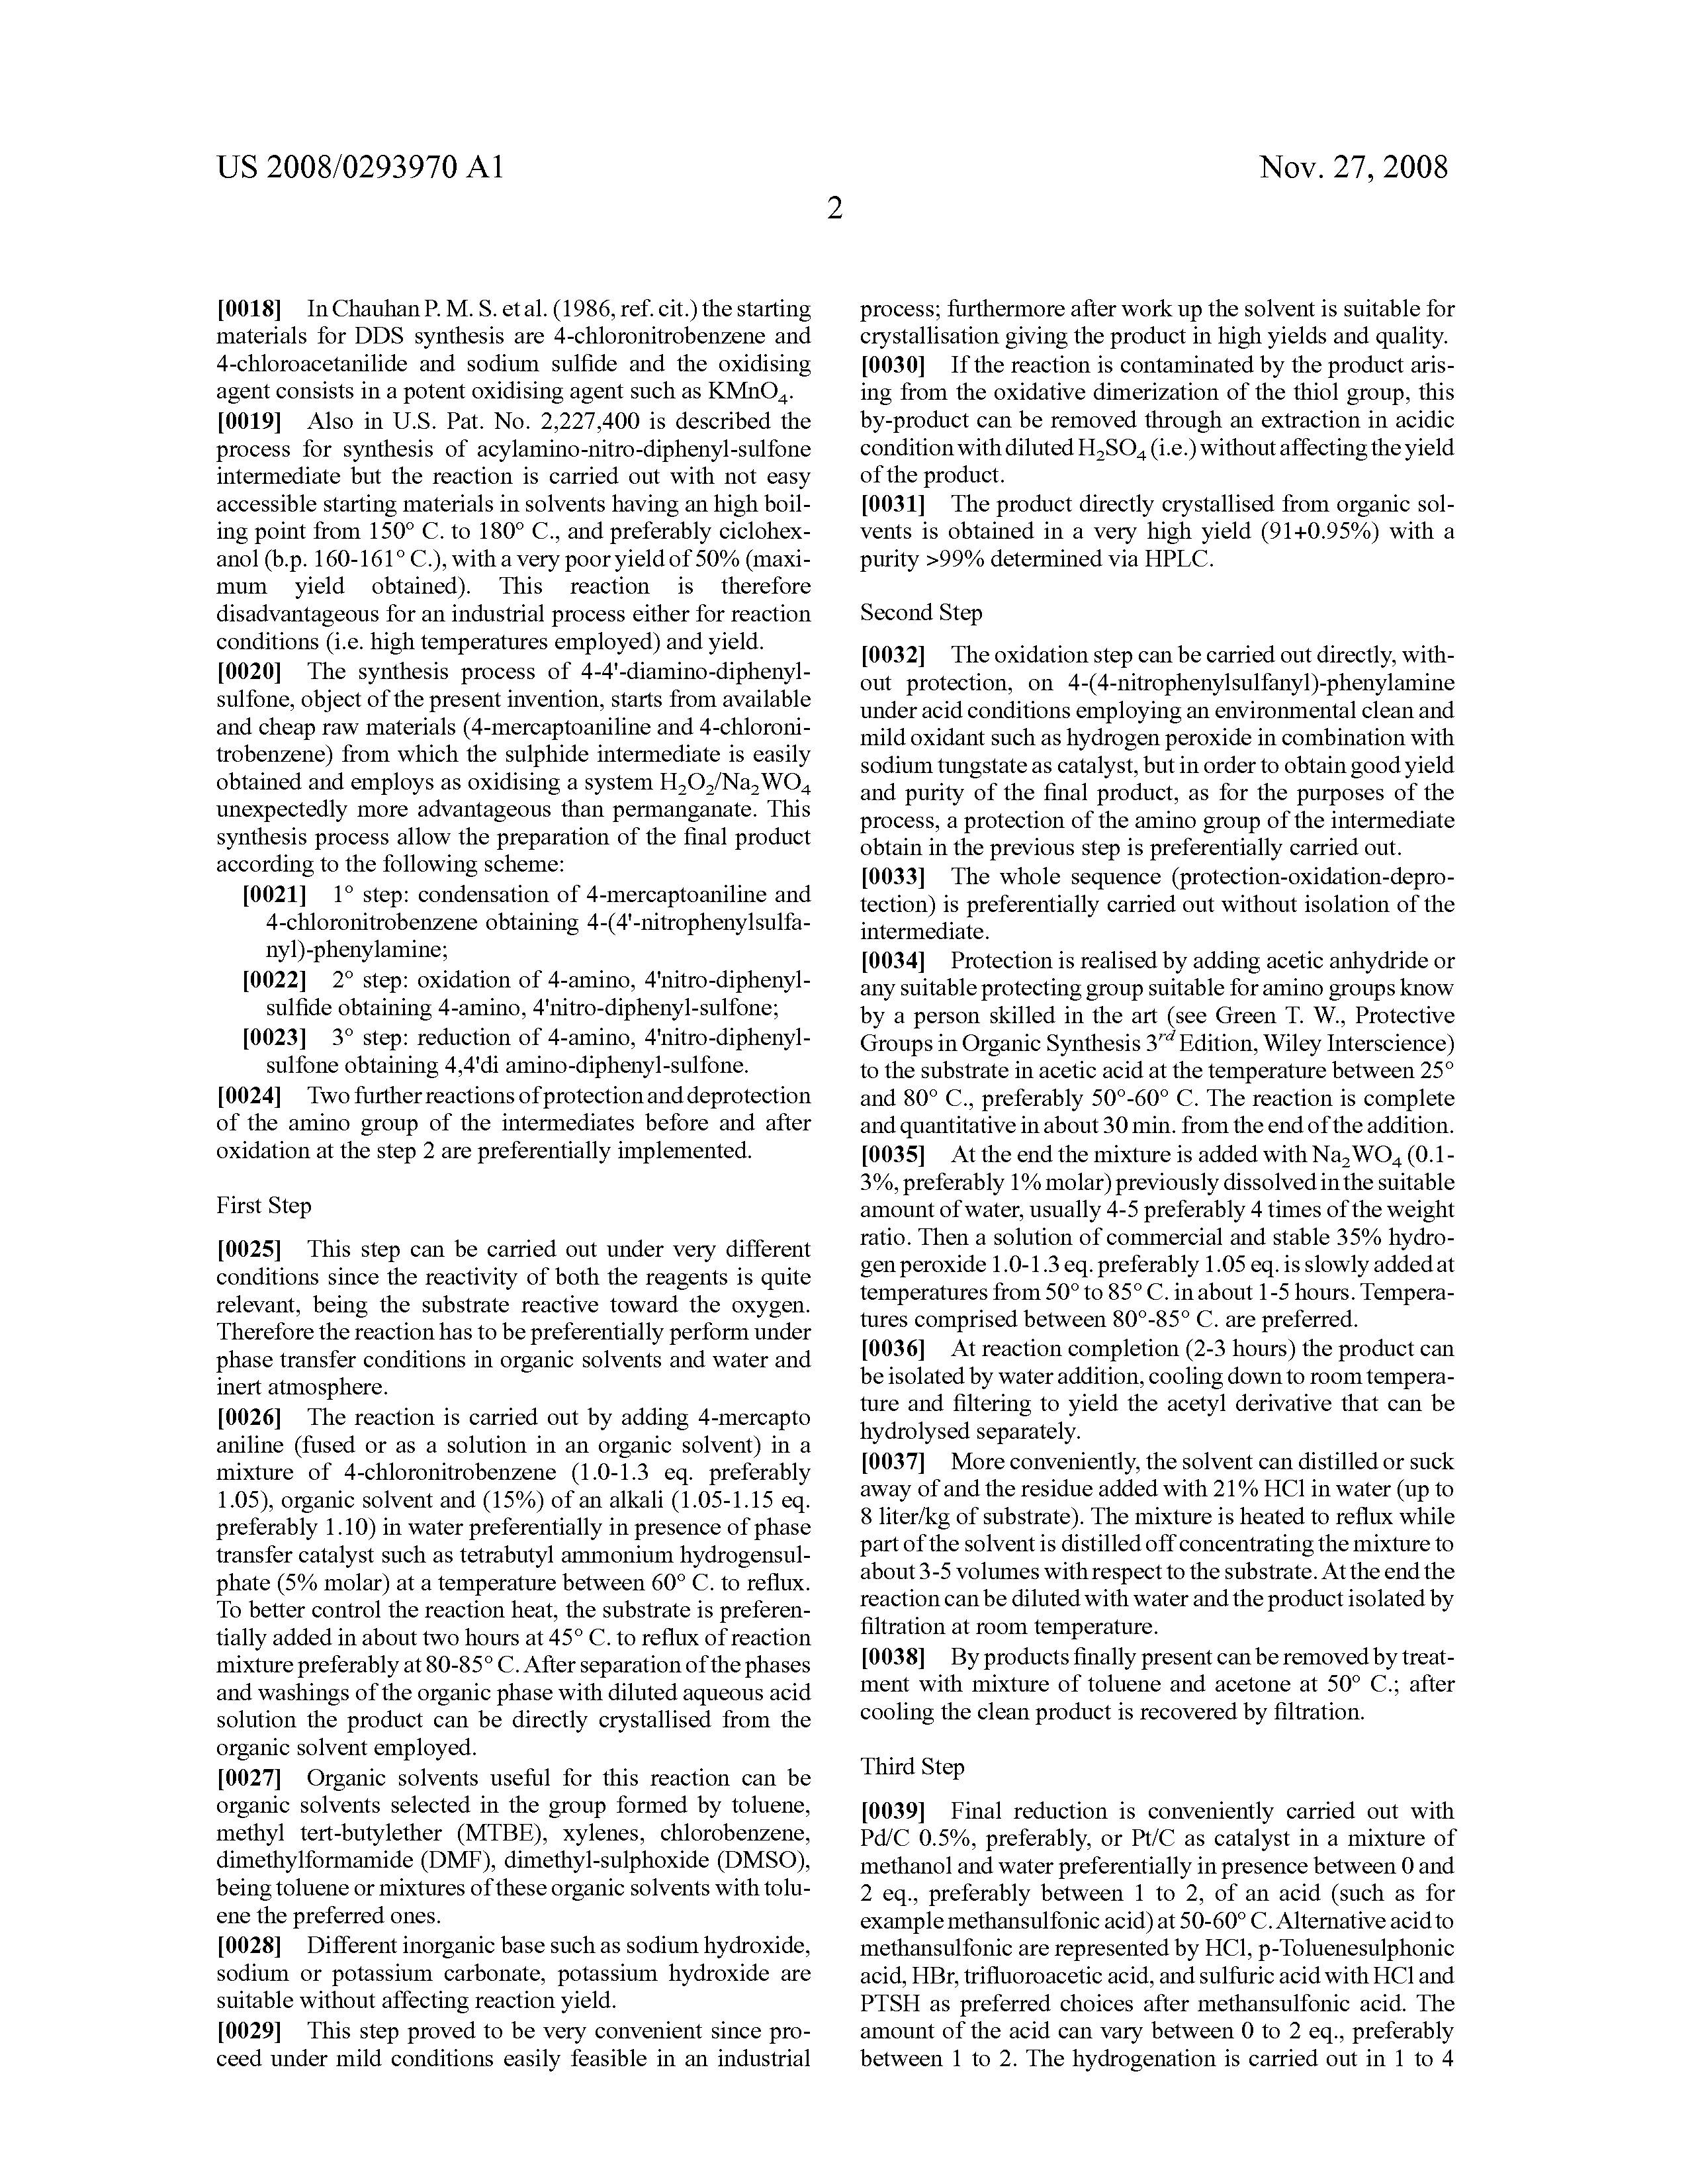 Long essay in faculty of arts